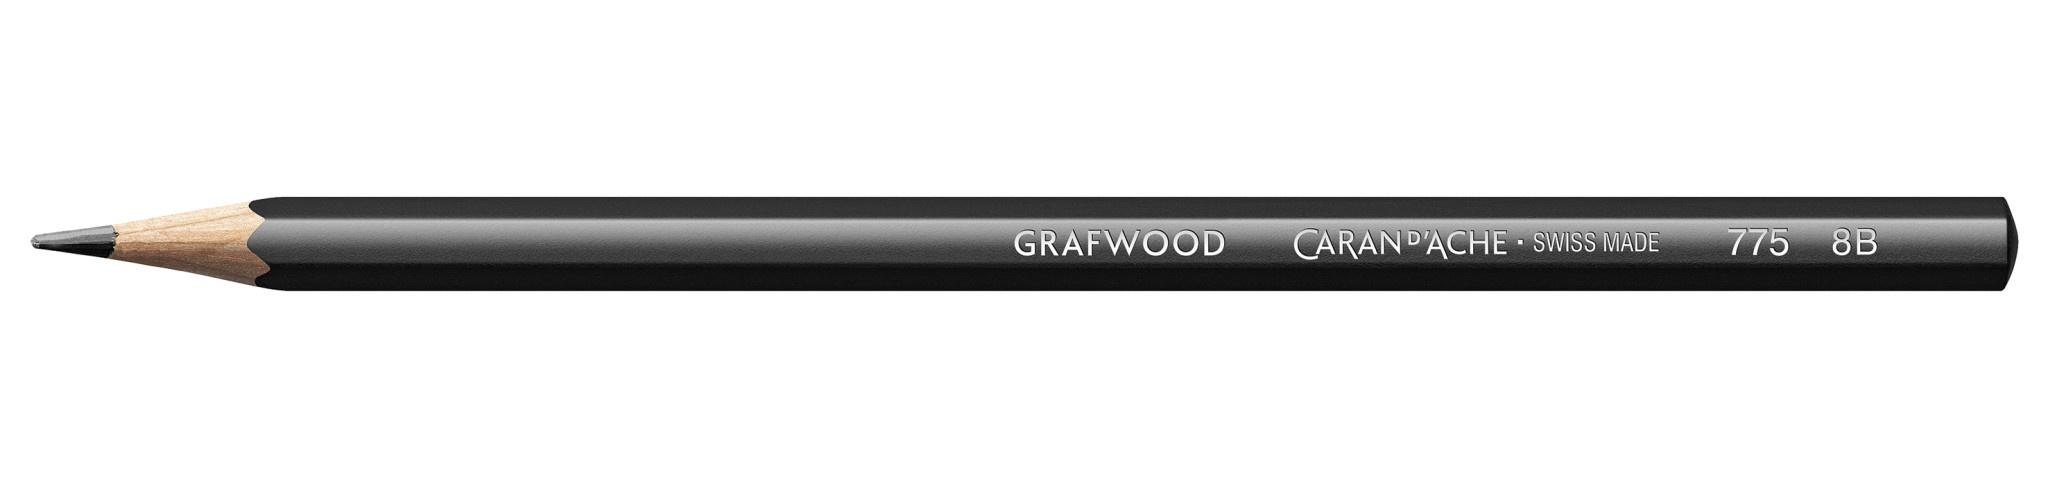 Caran d'Ache caran d'ache grafwood 8B